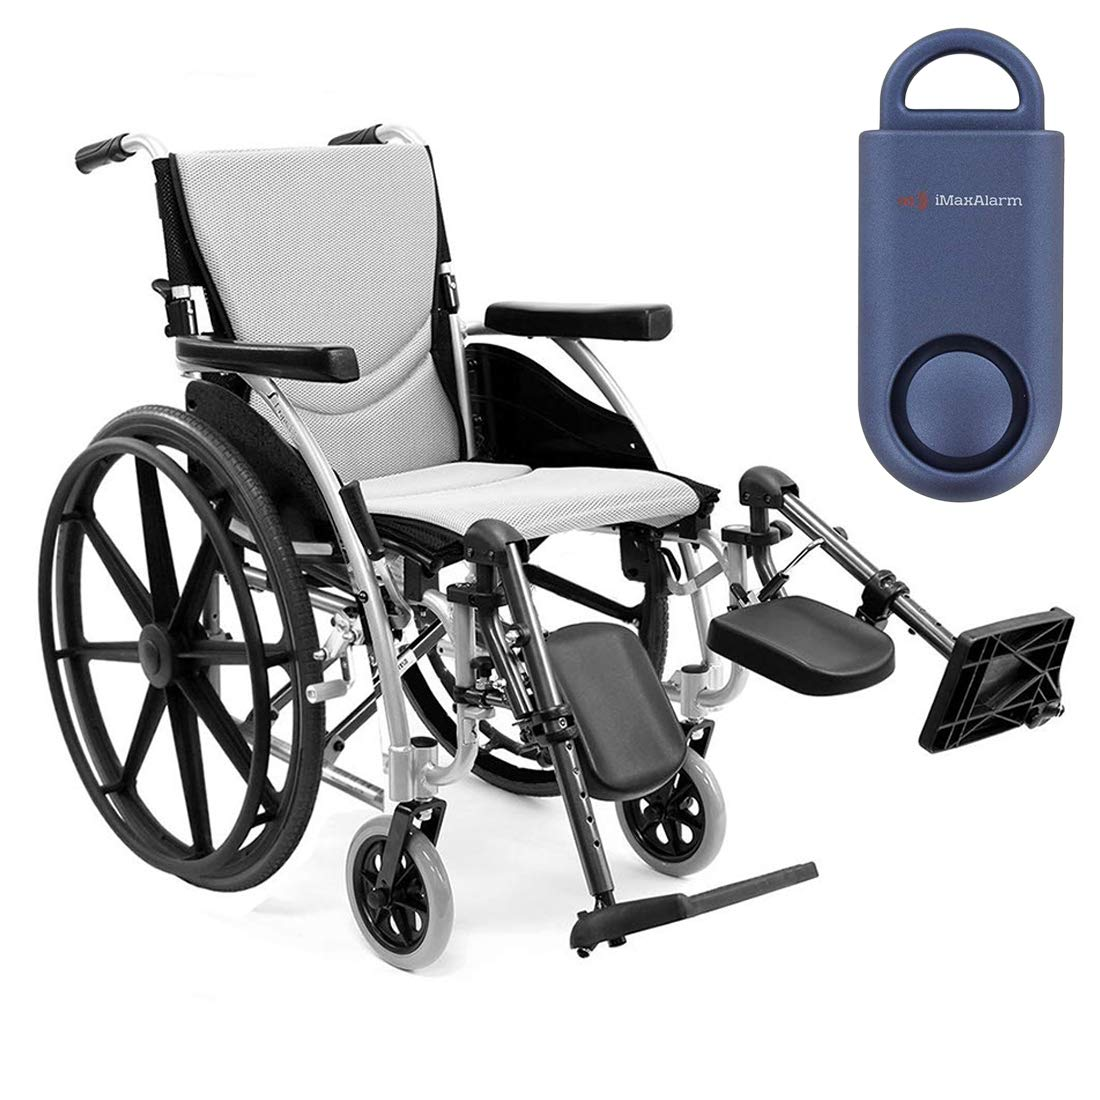 Karman S-Ergo 115 Ultra Seat Wheelchair Ergonomic Lightweight Max Very popular 48% OFF